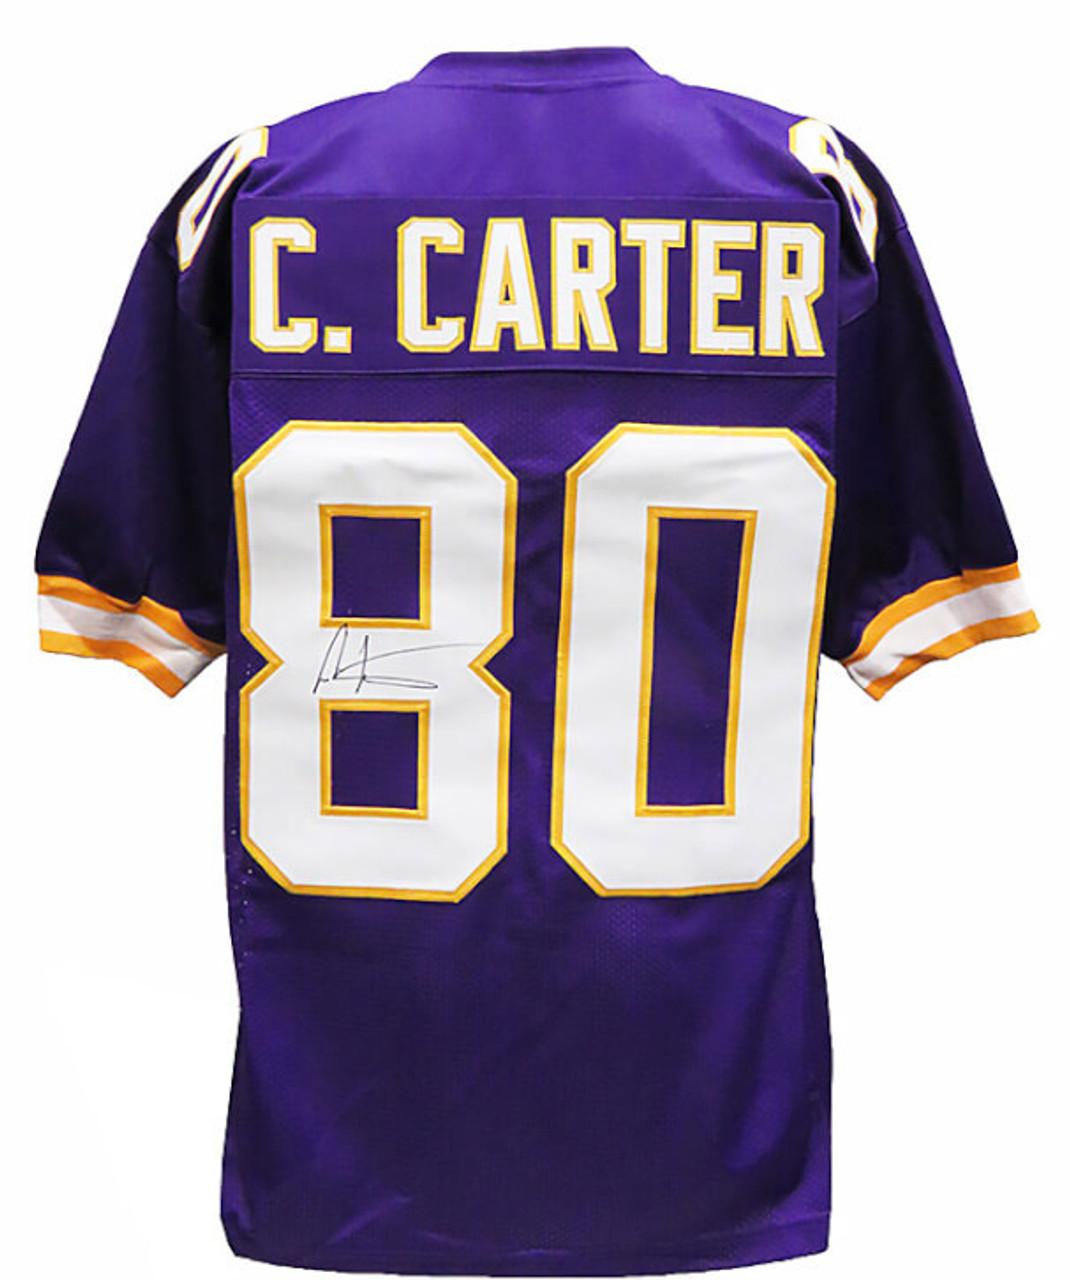 Cris Carter Minnesota Vikings Autographed Purple Throwback Custom Football Jersey